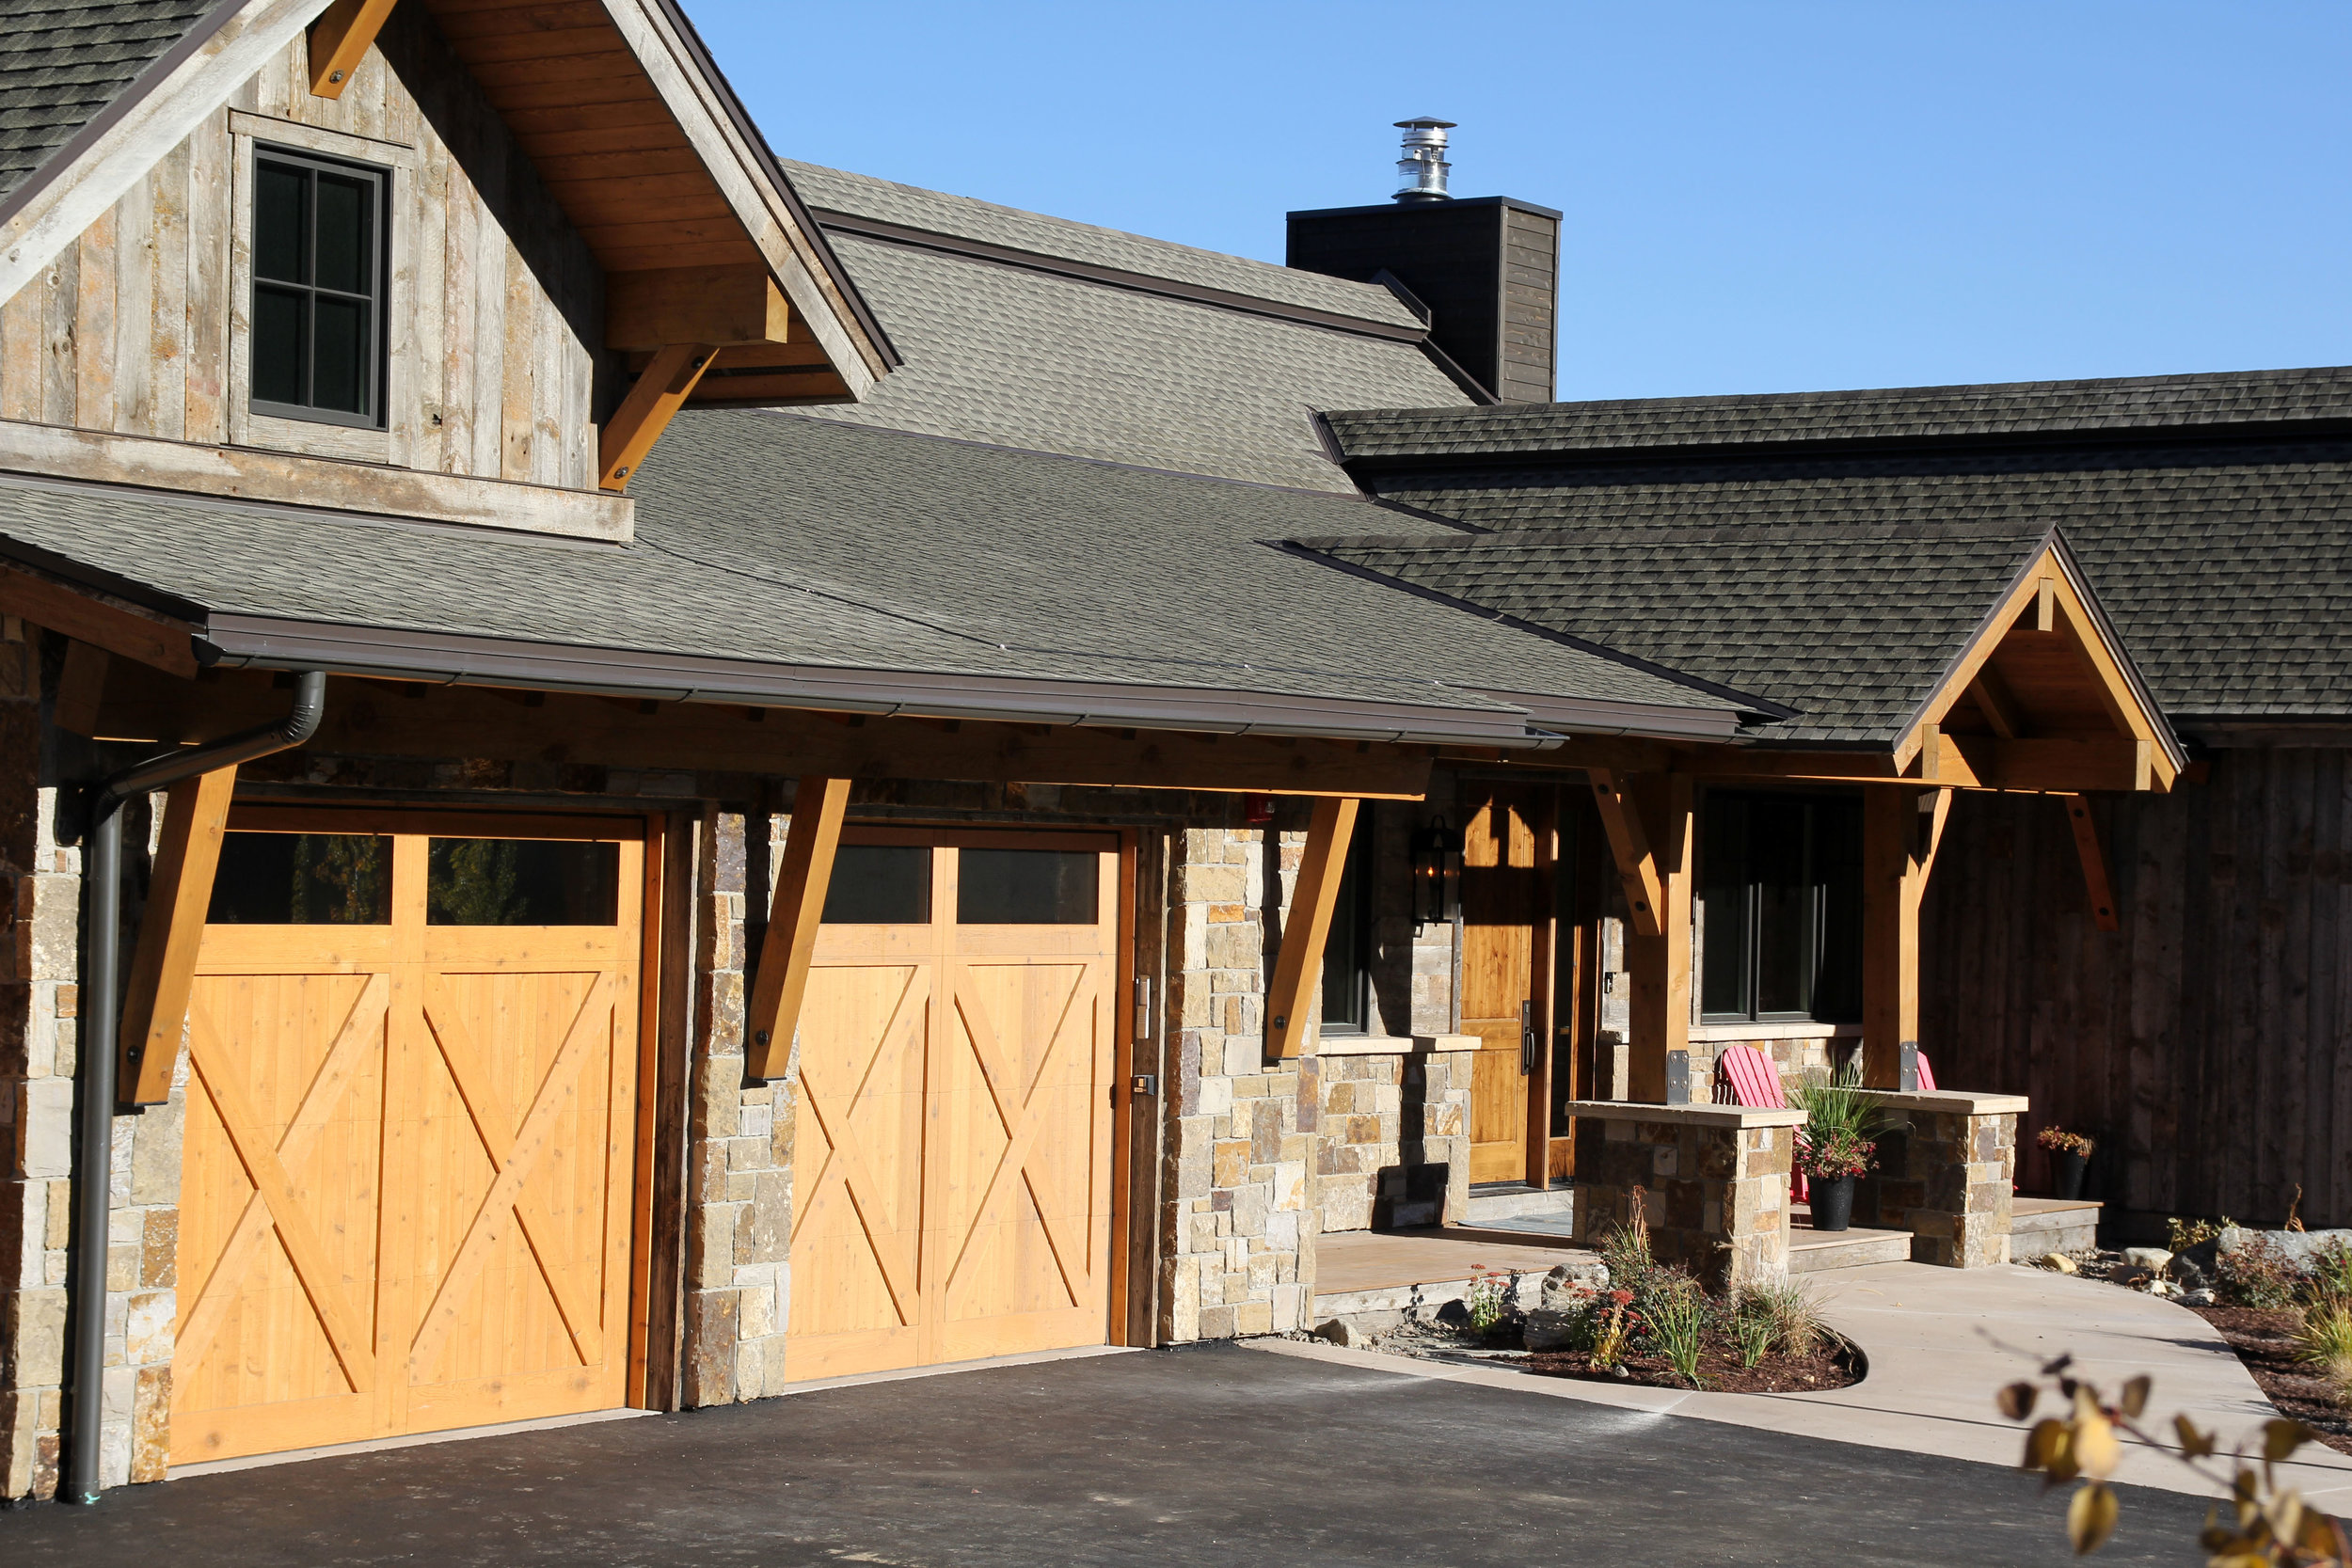 Colorado Residential Architect Sudol 4.jpg